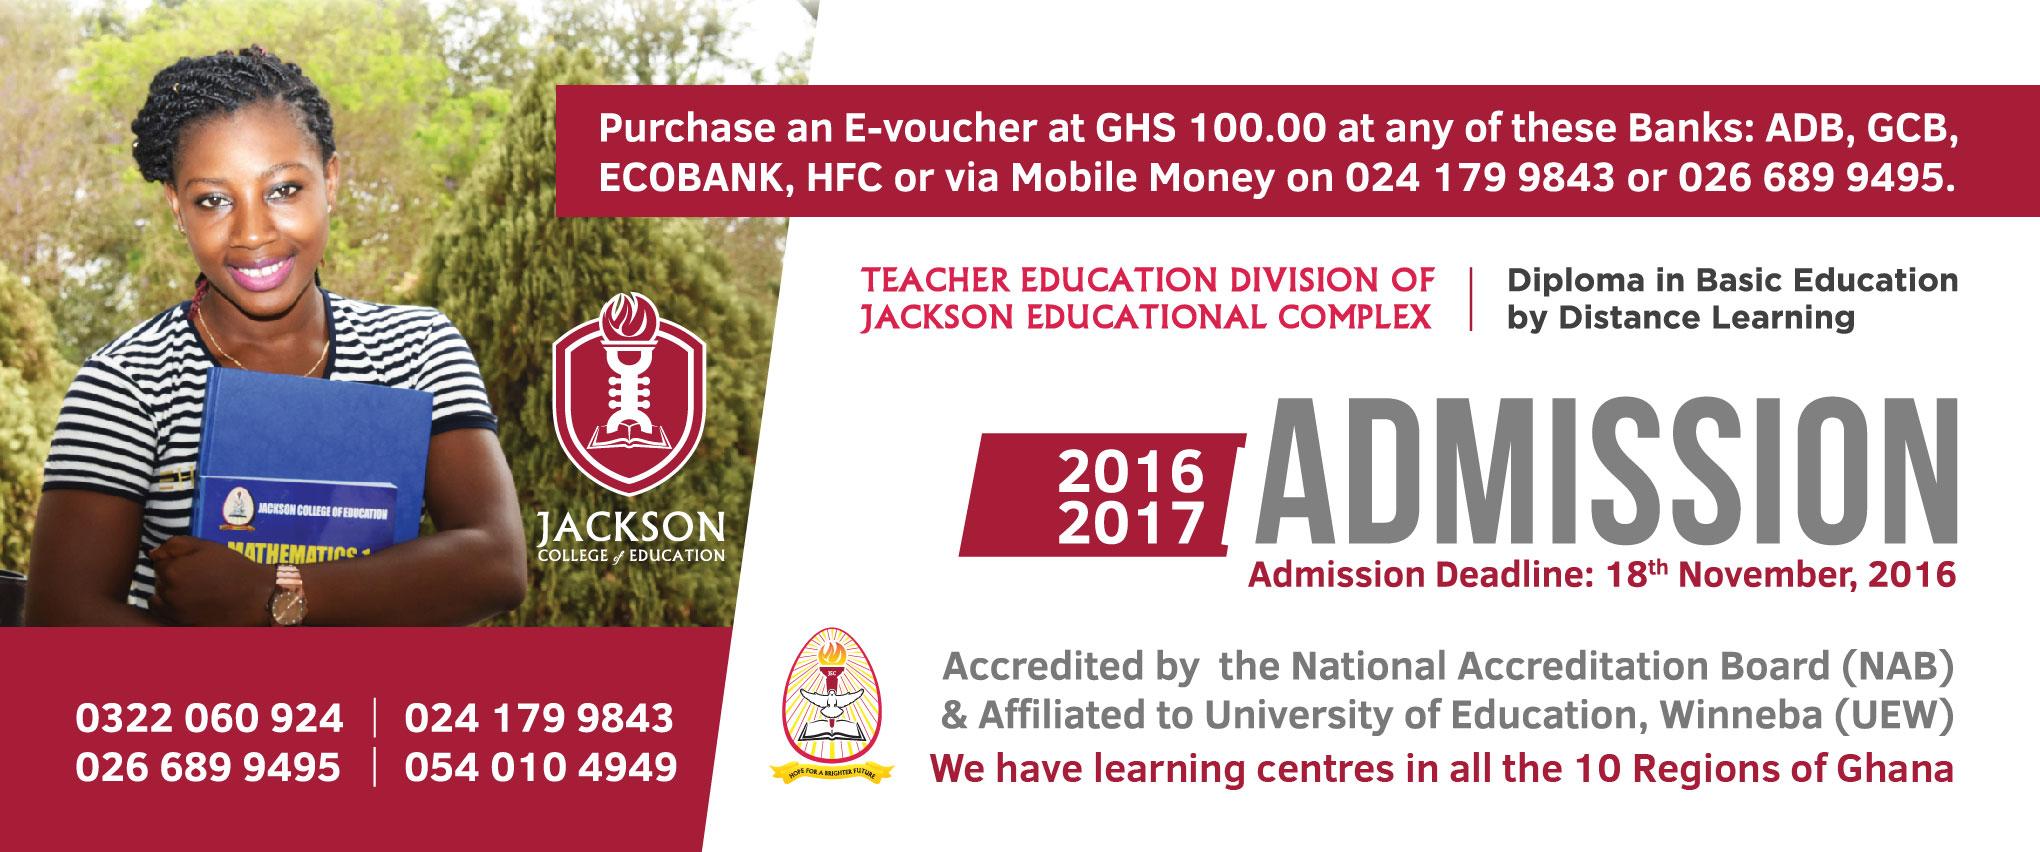 jec-web-banner-2016-admission-final-august10-f_1